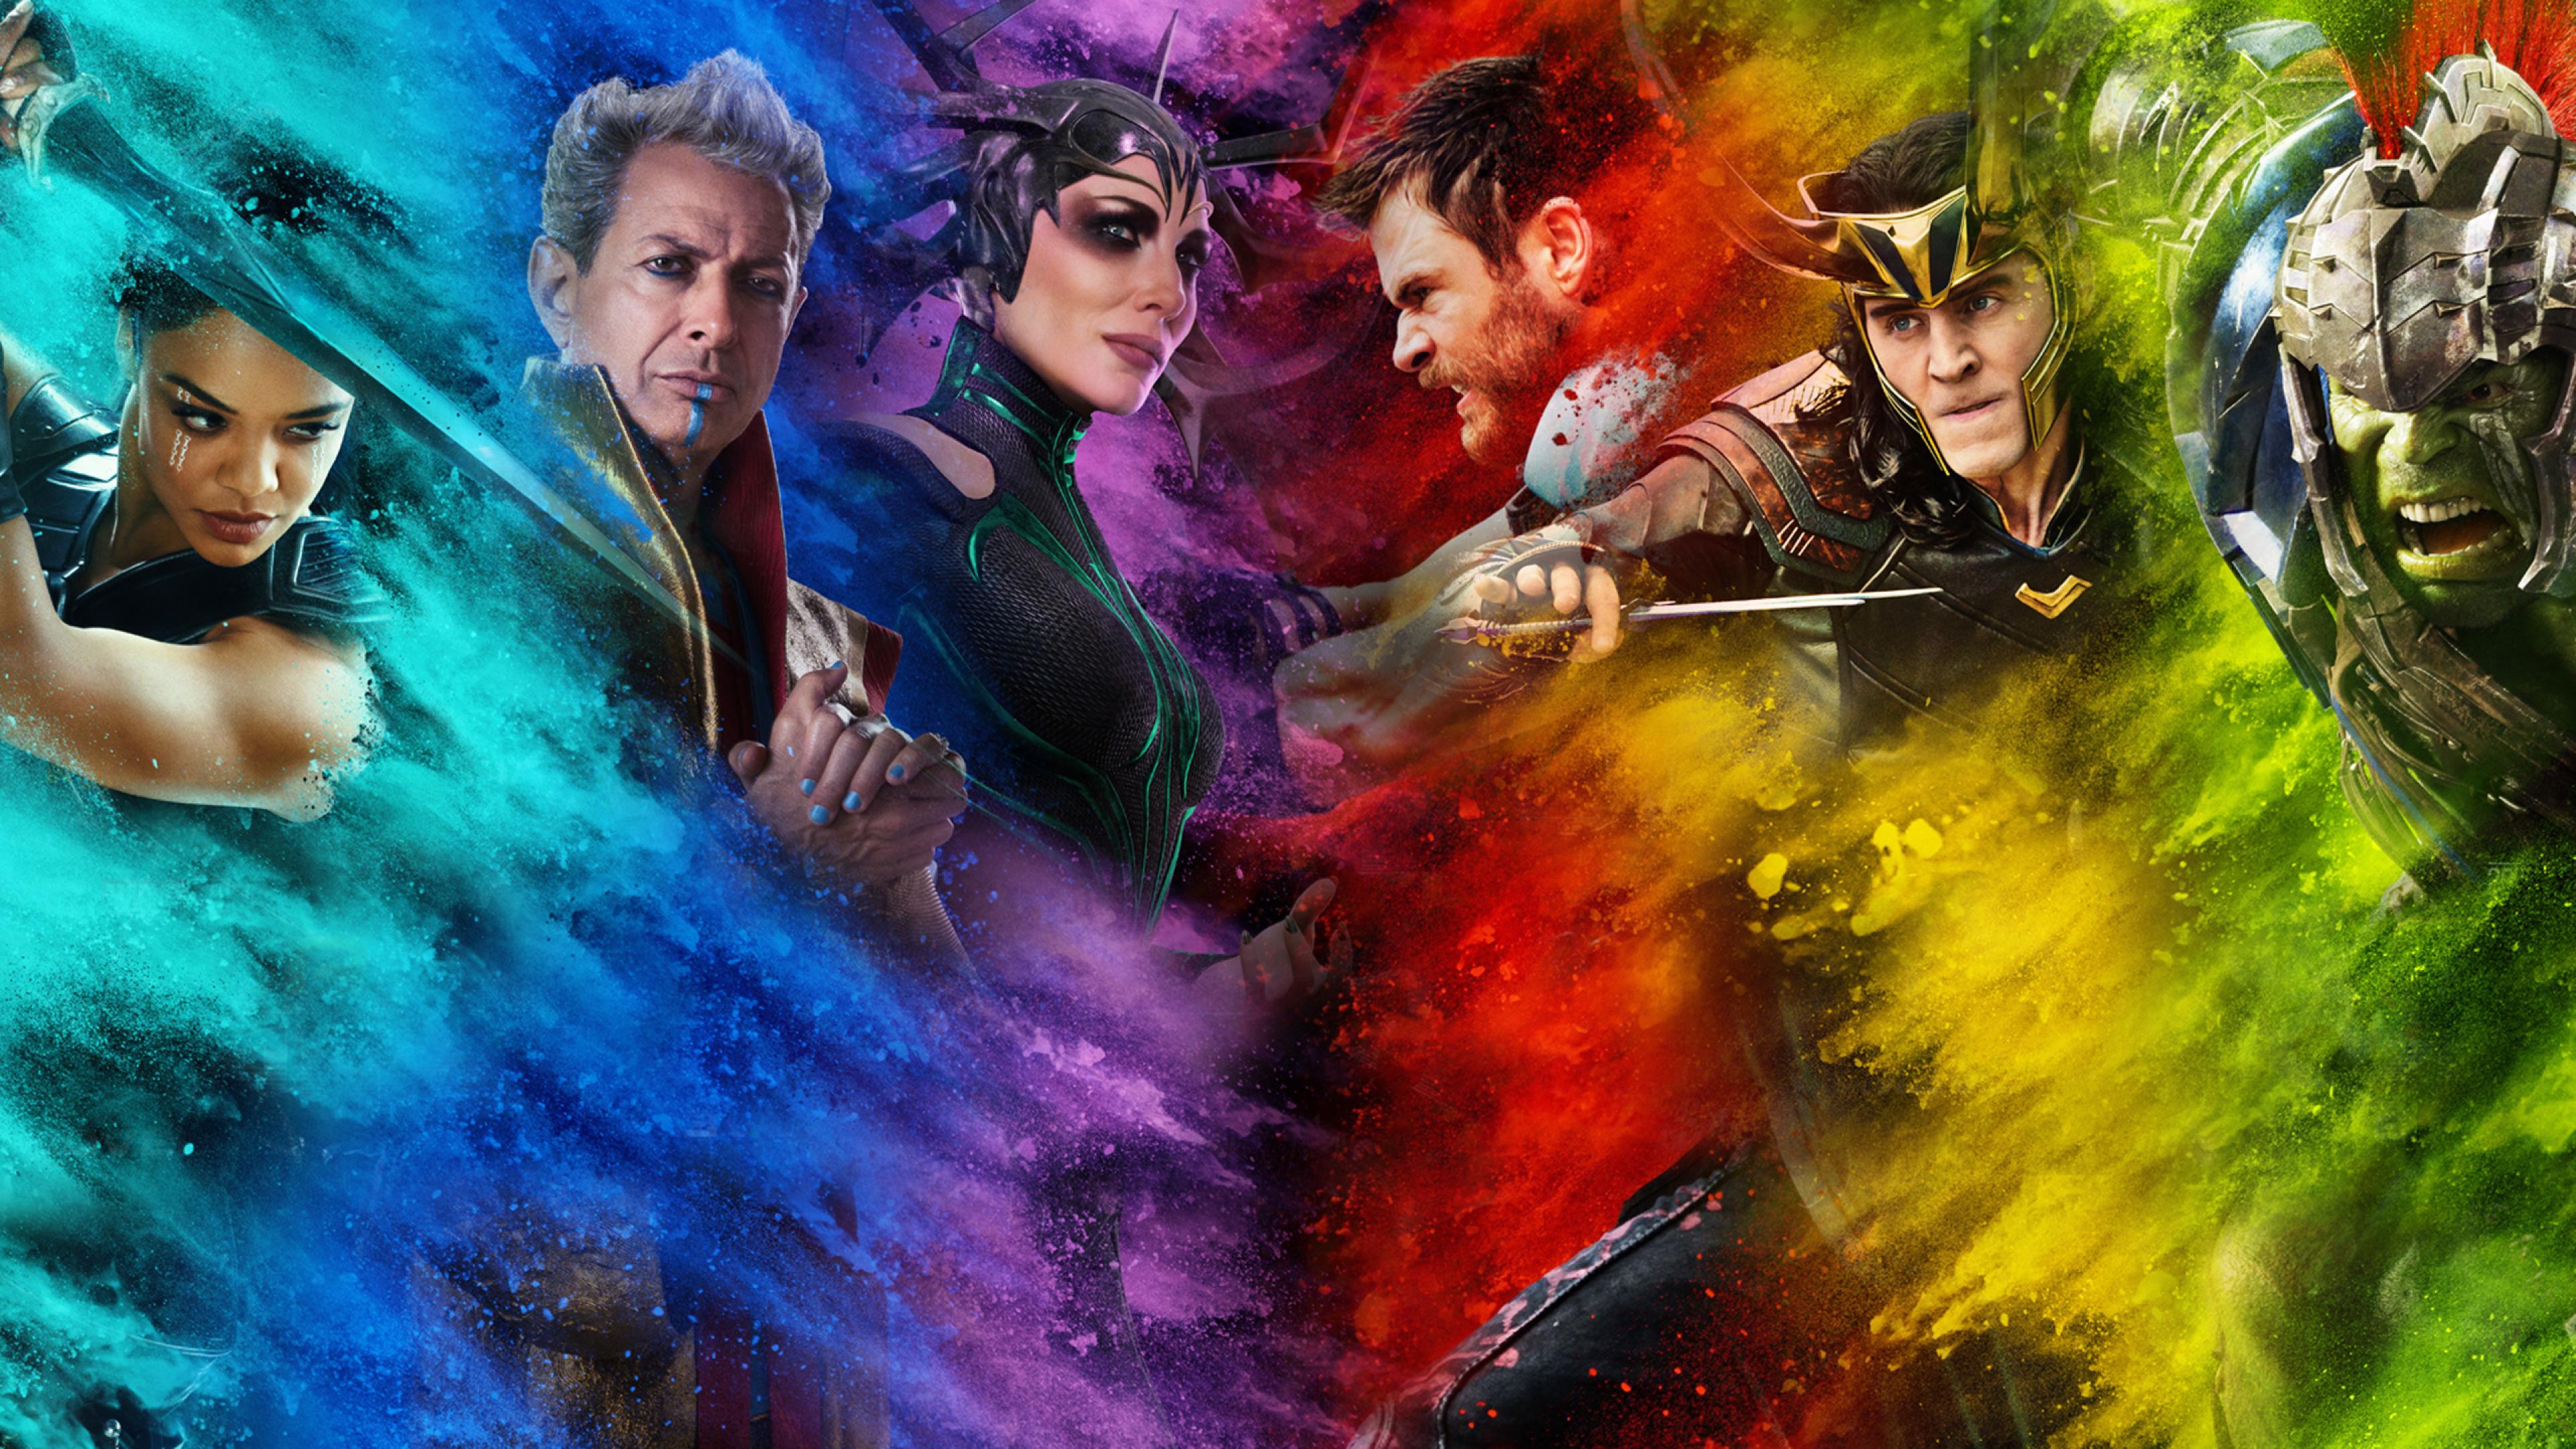 3840x2160 Thor Ragnarok Poster 4K Wallpaper, HD Movies 4K ...